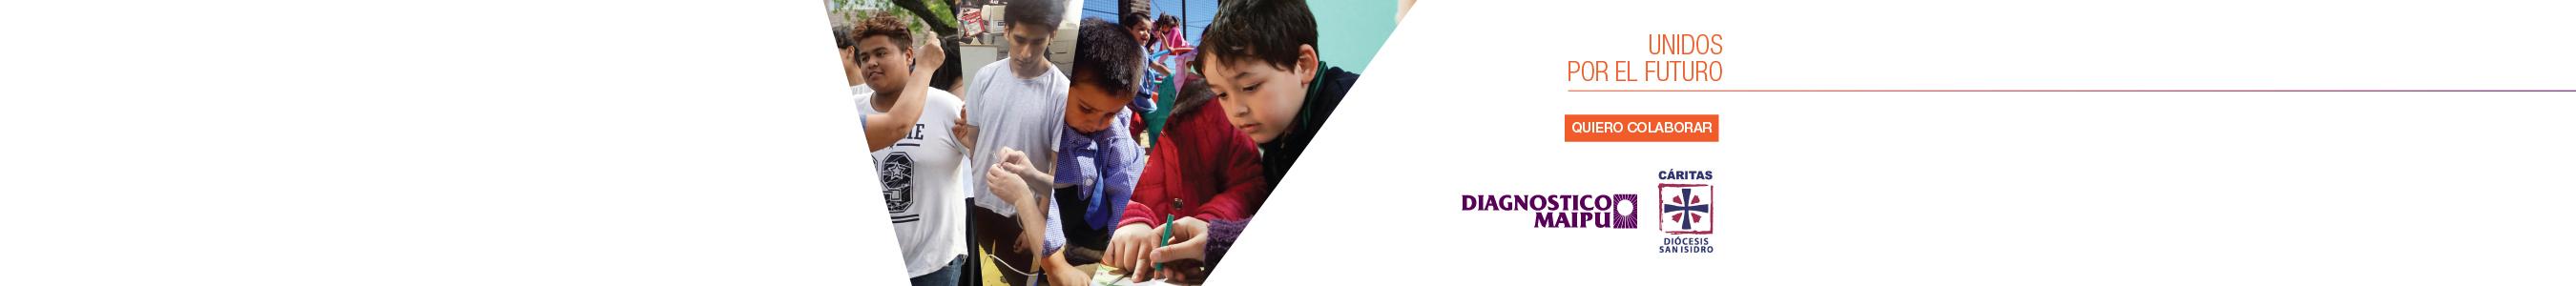 Banner-Web_Caritas-Rse